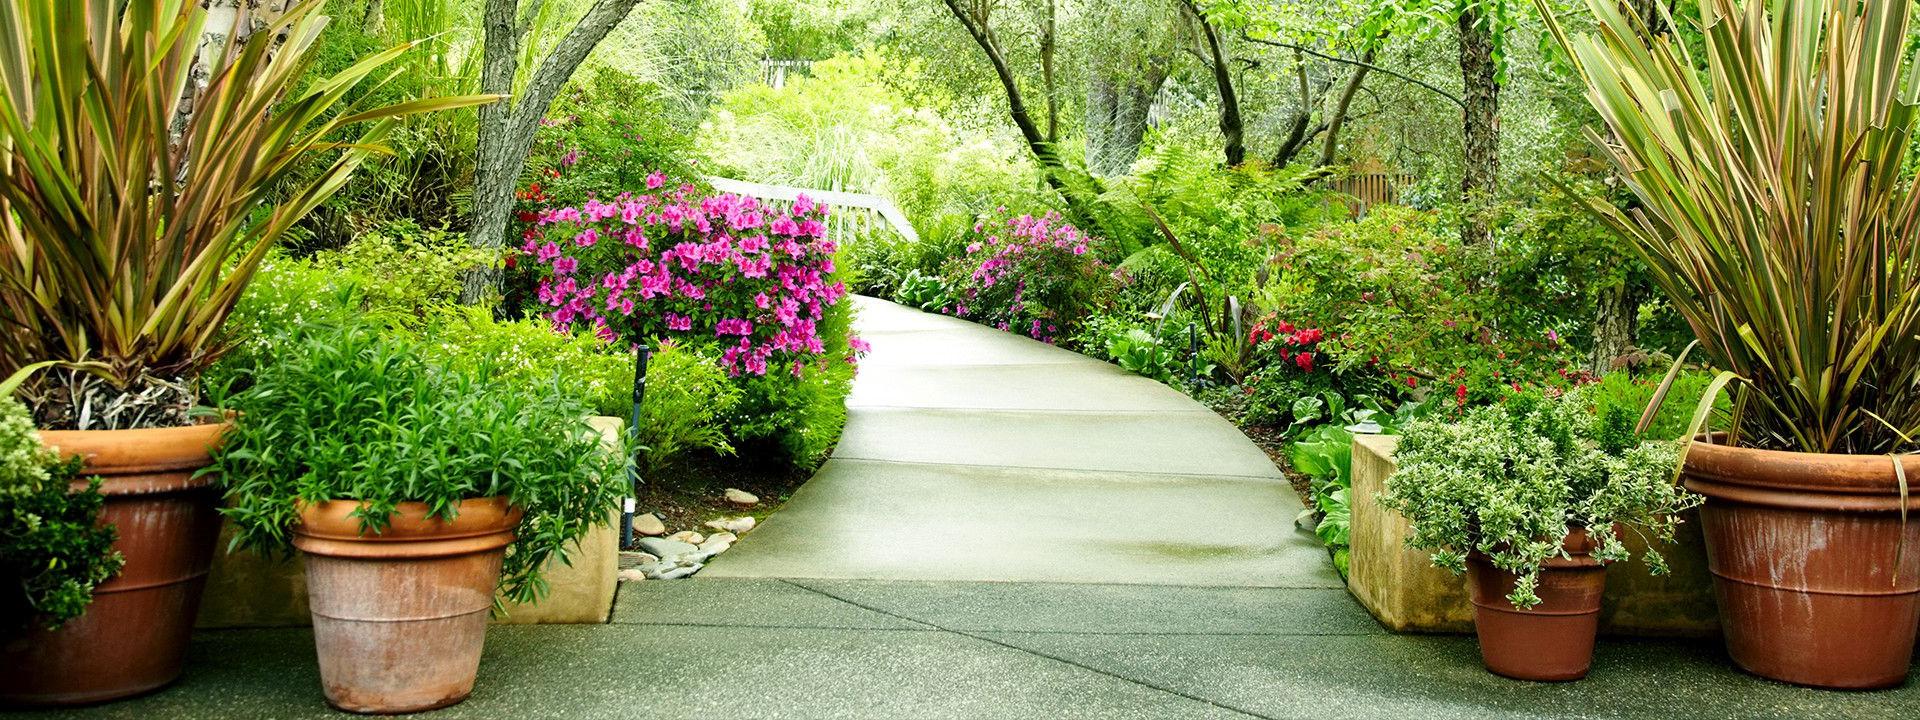 Resources | Samaritan Funeral Home & Cremation Services